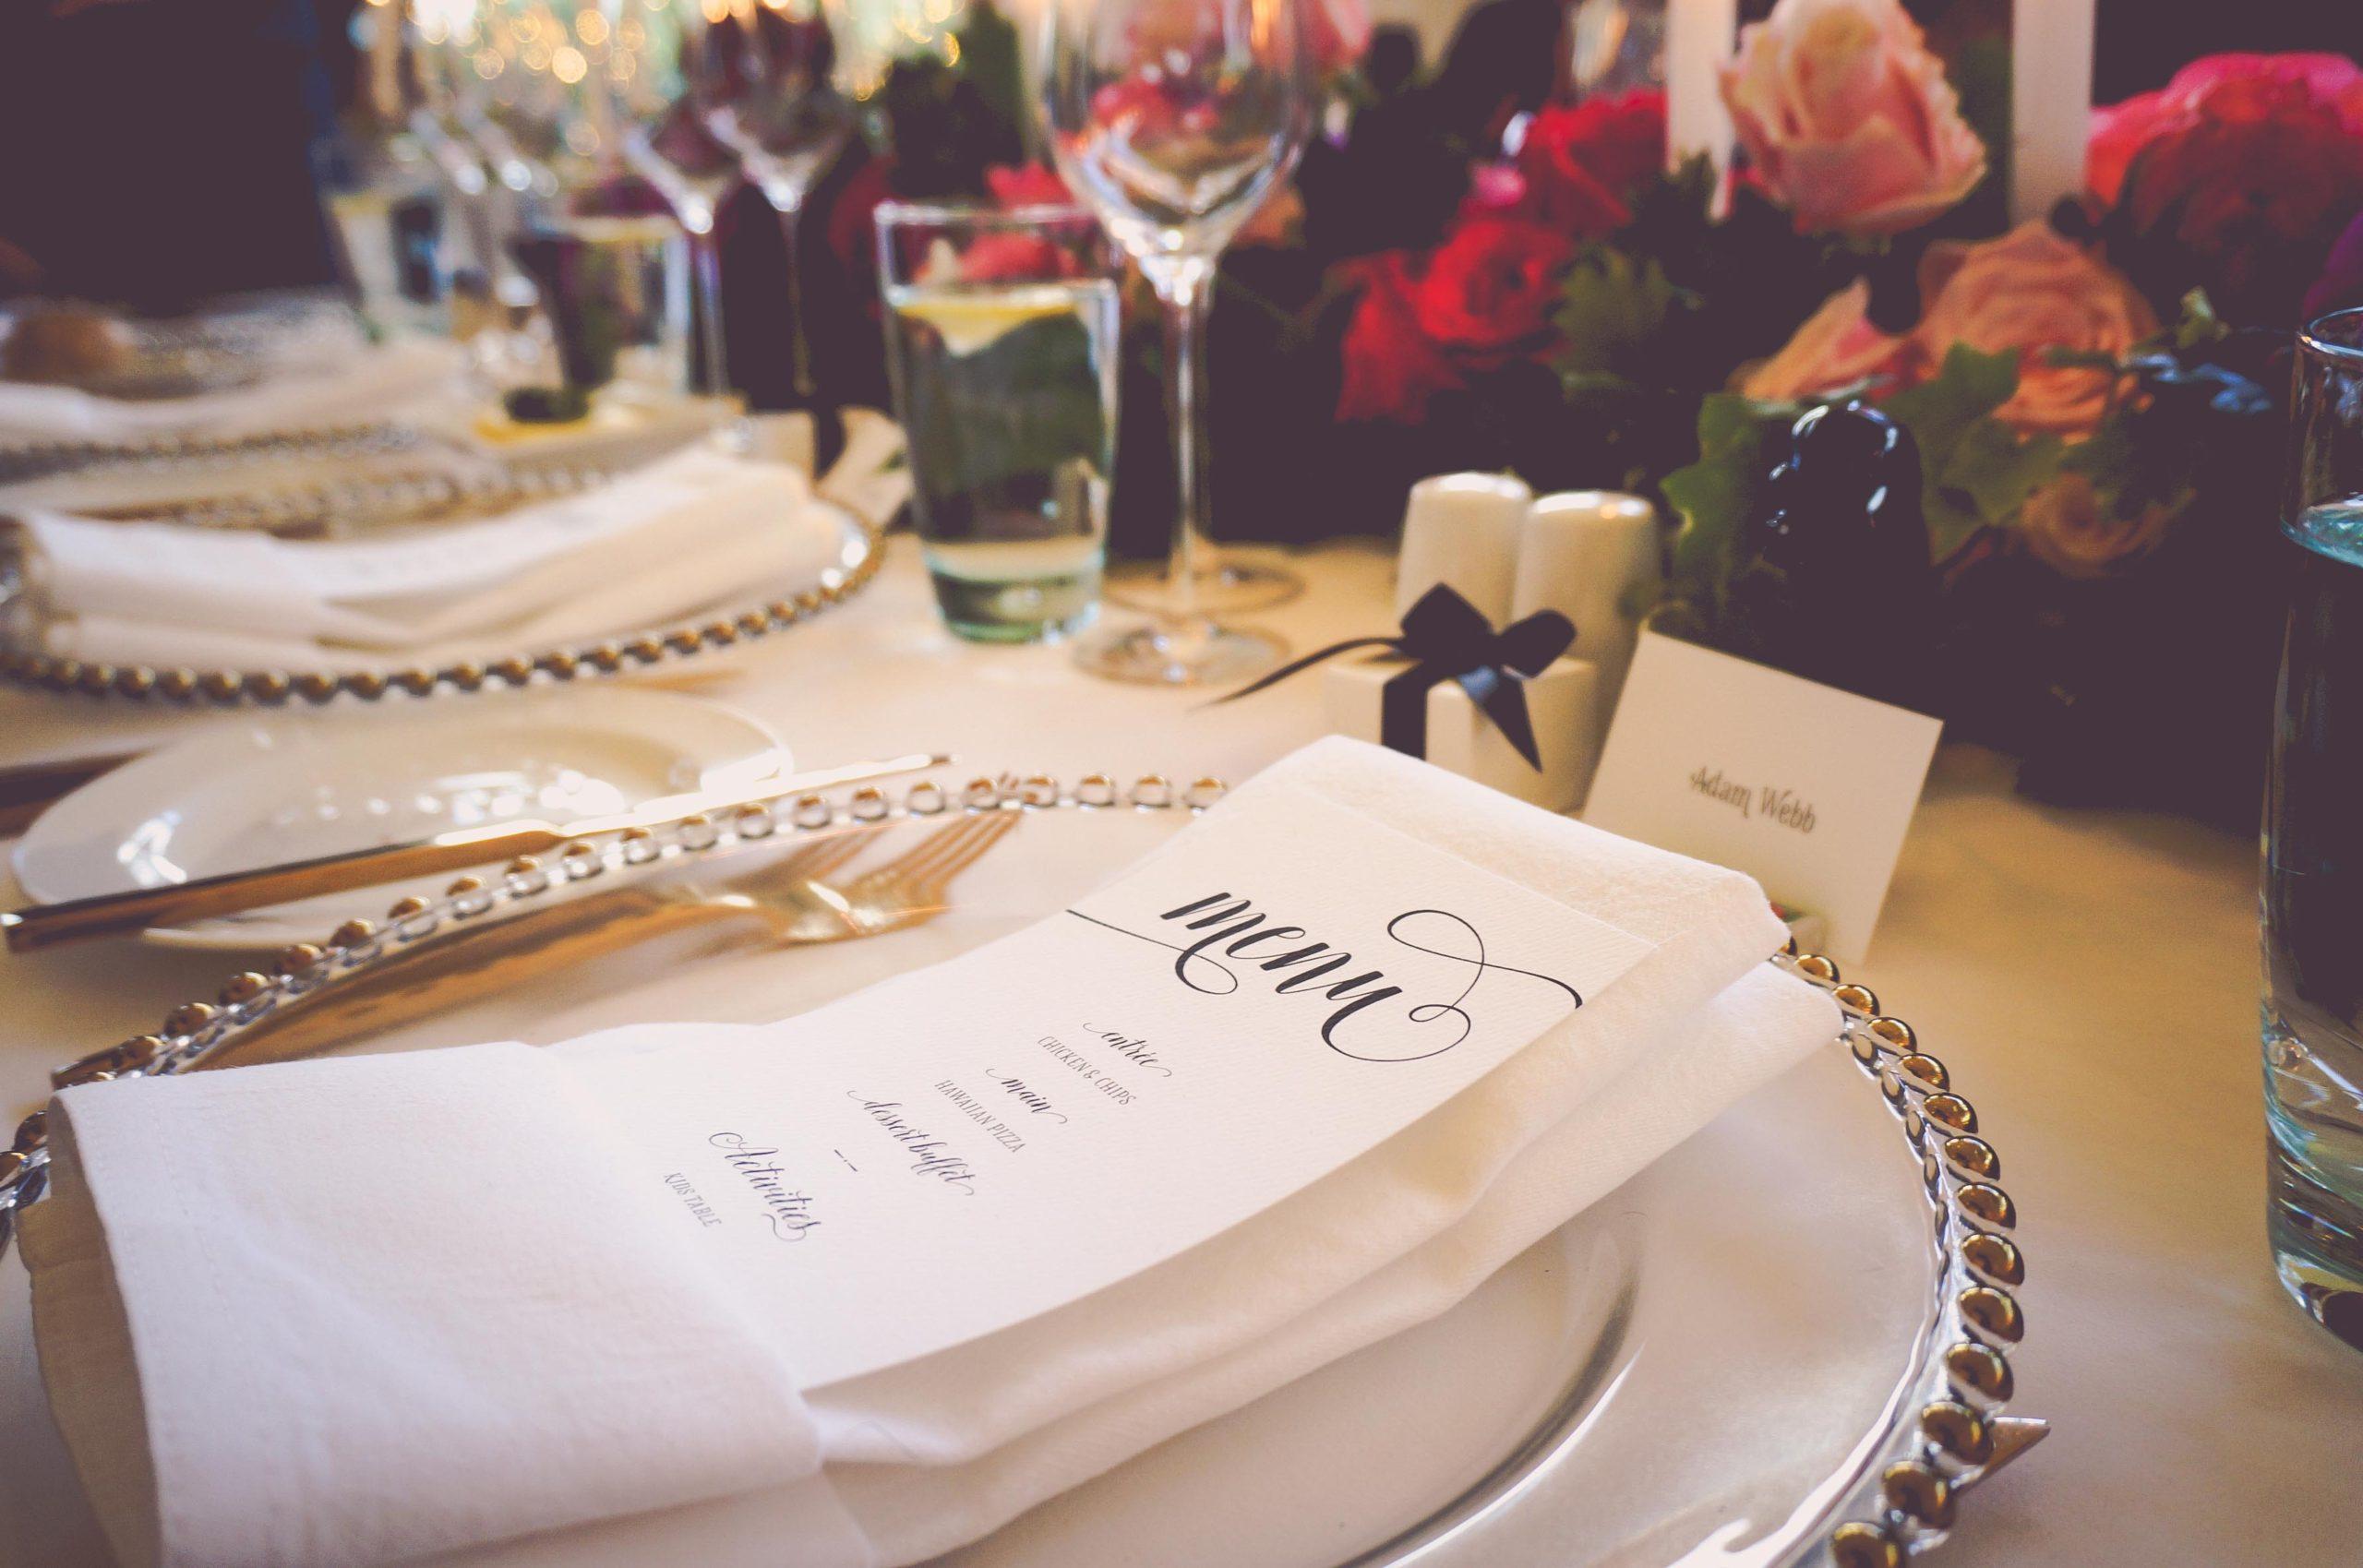 Wedding Menu in luxurious table setting